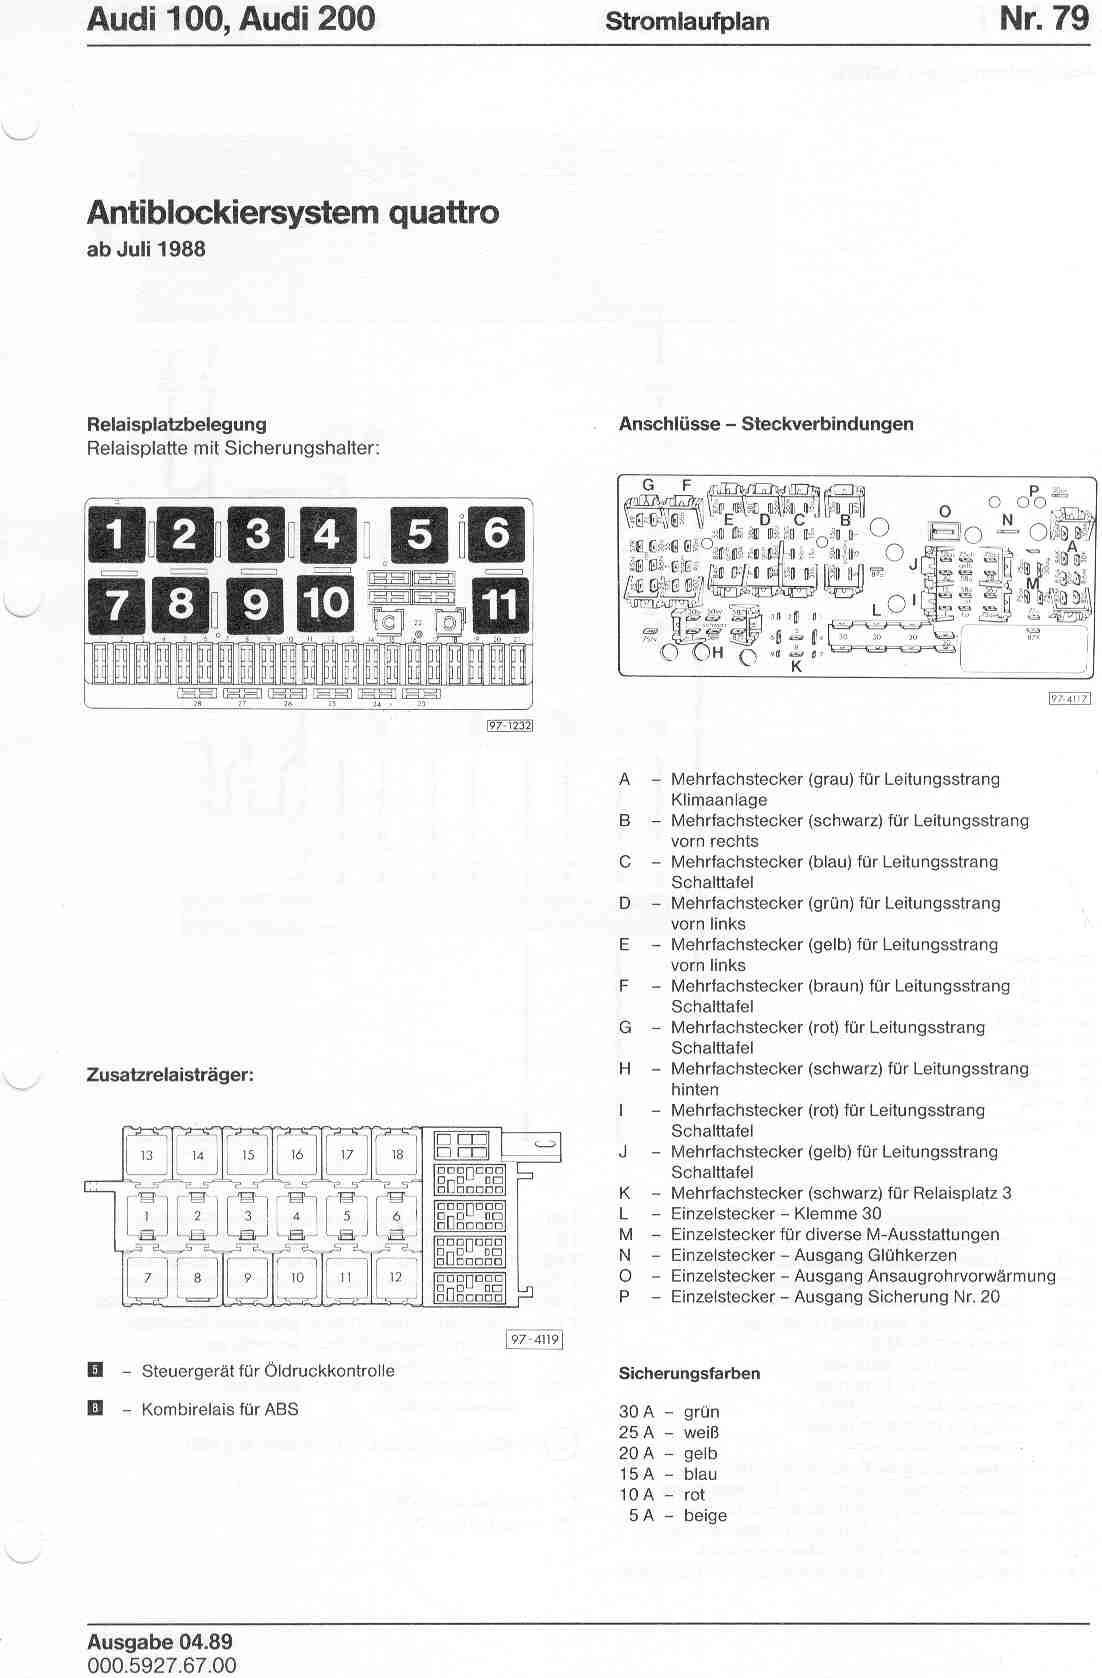 audi 100 200 factory wiring diagrams rh sizov org audi 100 c4 wiring diagram Audi A4 Schematic